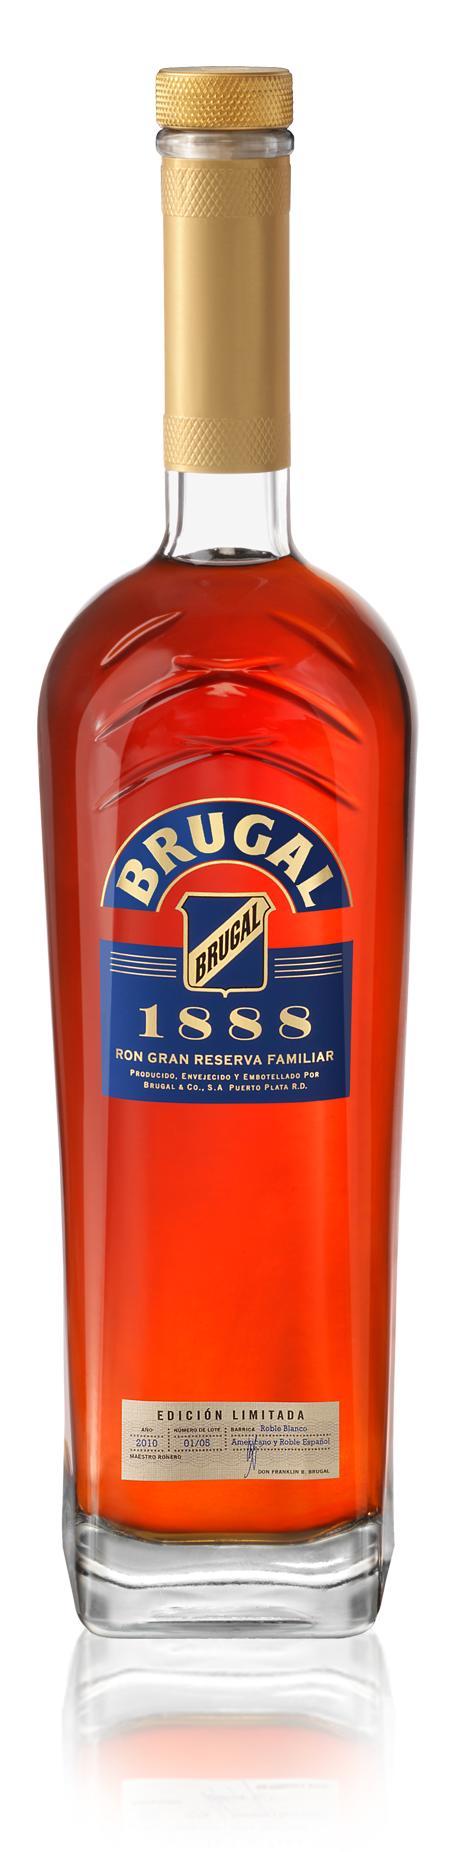 Packshot Brugal 1888